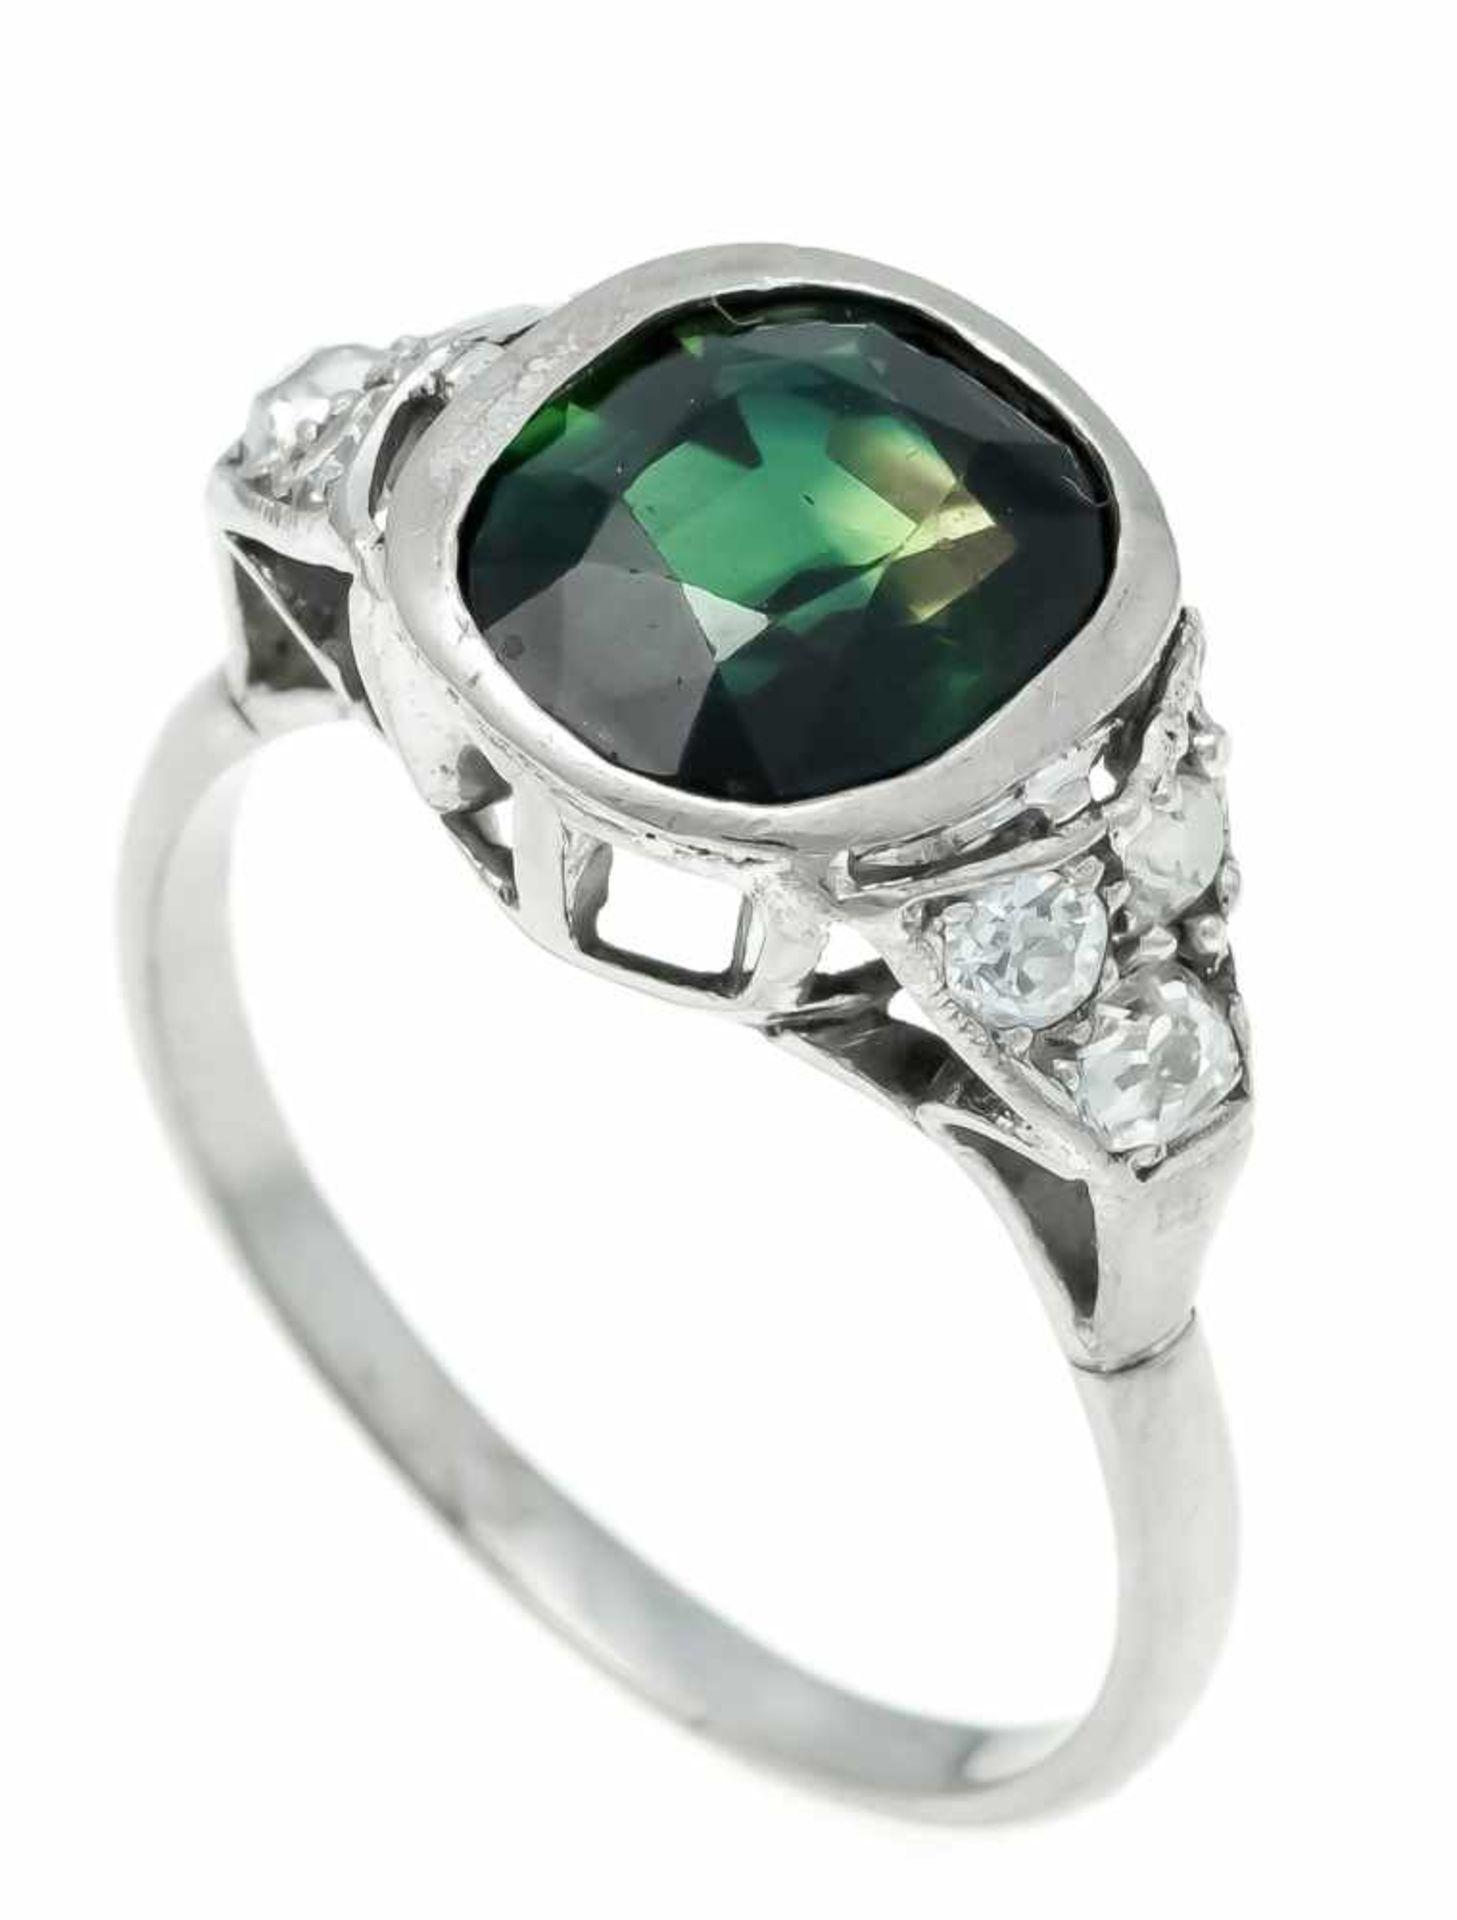 Turmalin-Altschliff-Diamant-Ring Palladium 800/000 mit einem oval fac. Turmalin, 10,1 x 9,4 mm,